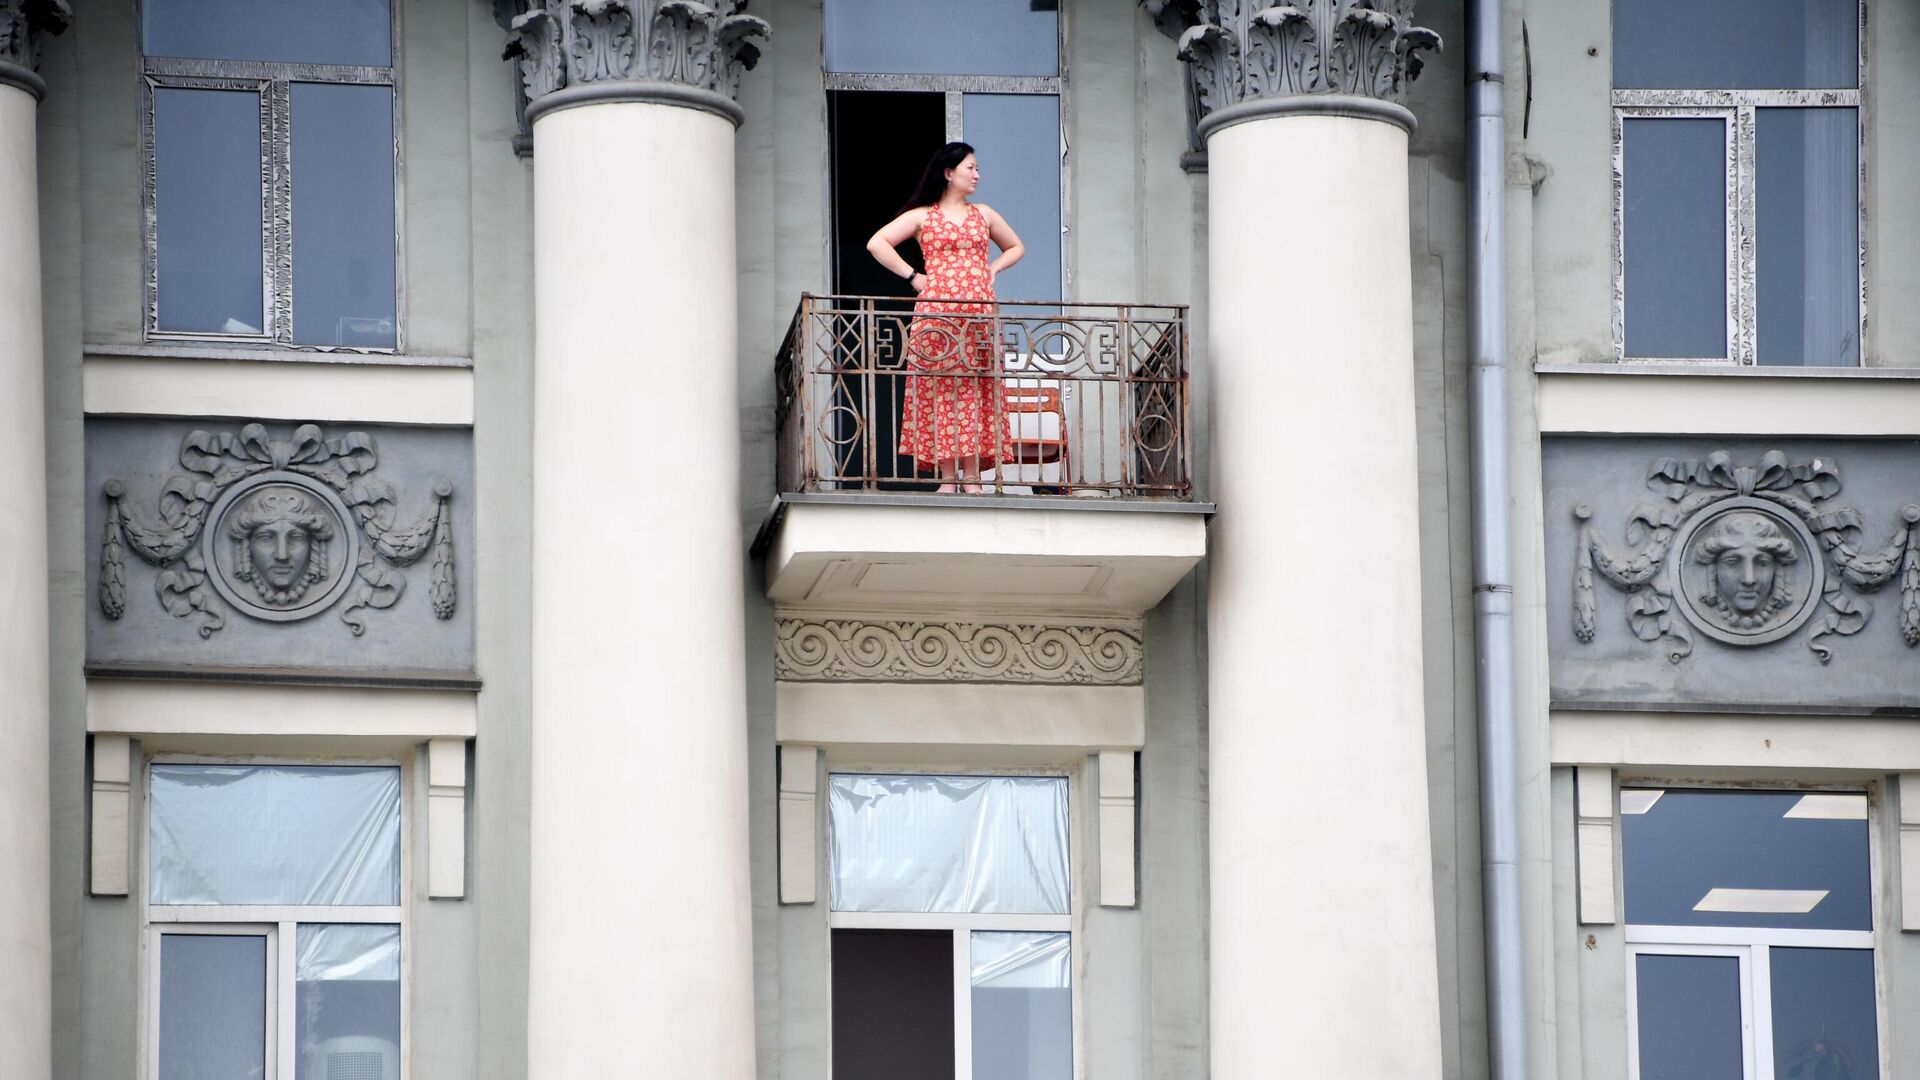 Девушка на балконе жилого дома в Москве - РИА Новости, 1920, 30.07.2021